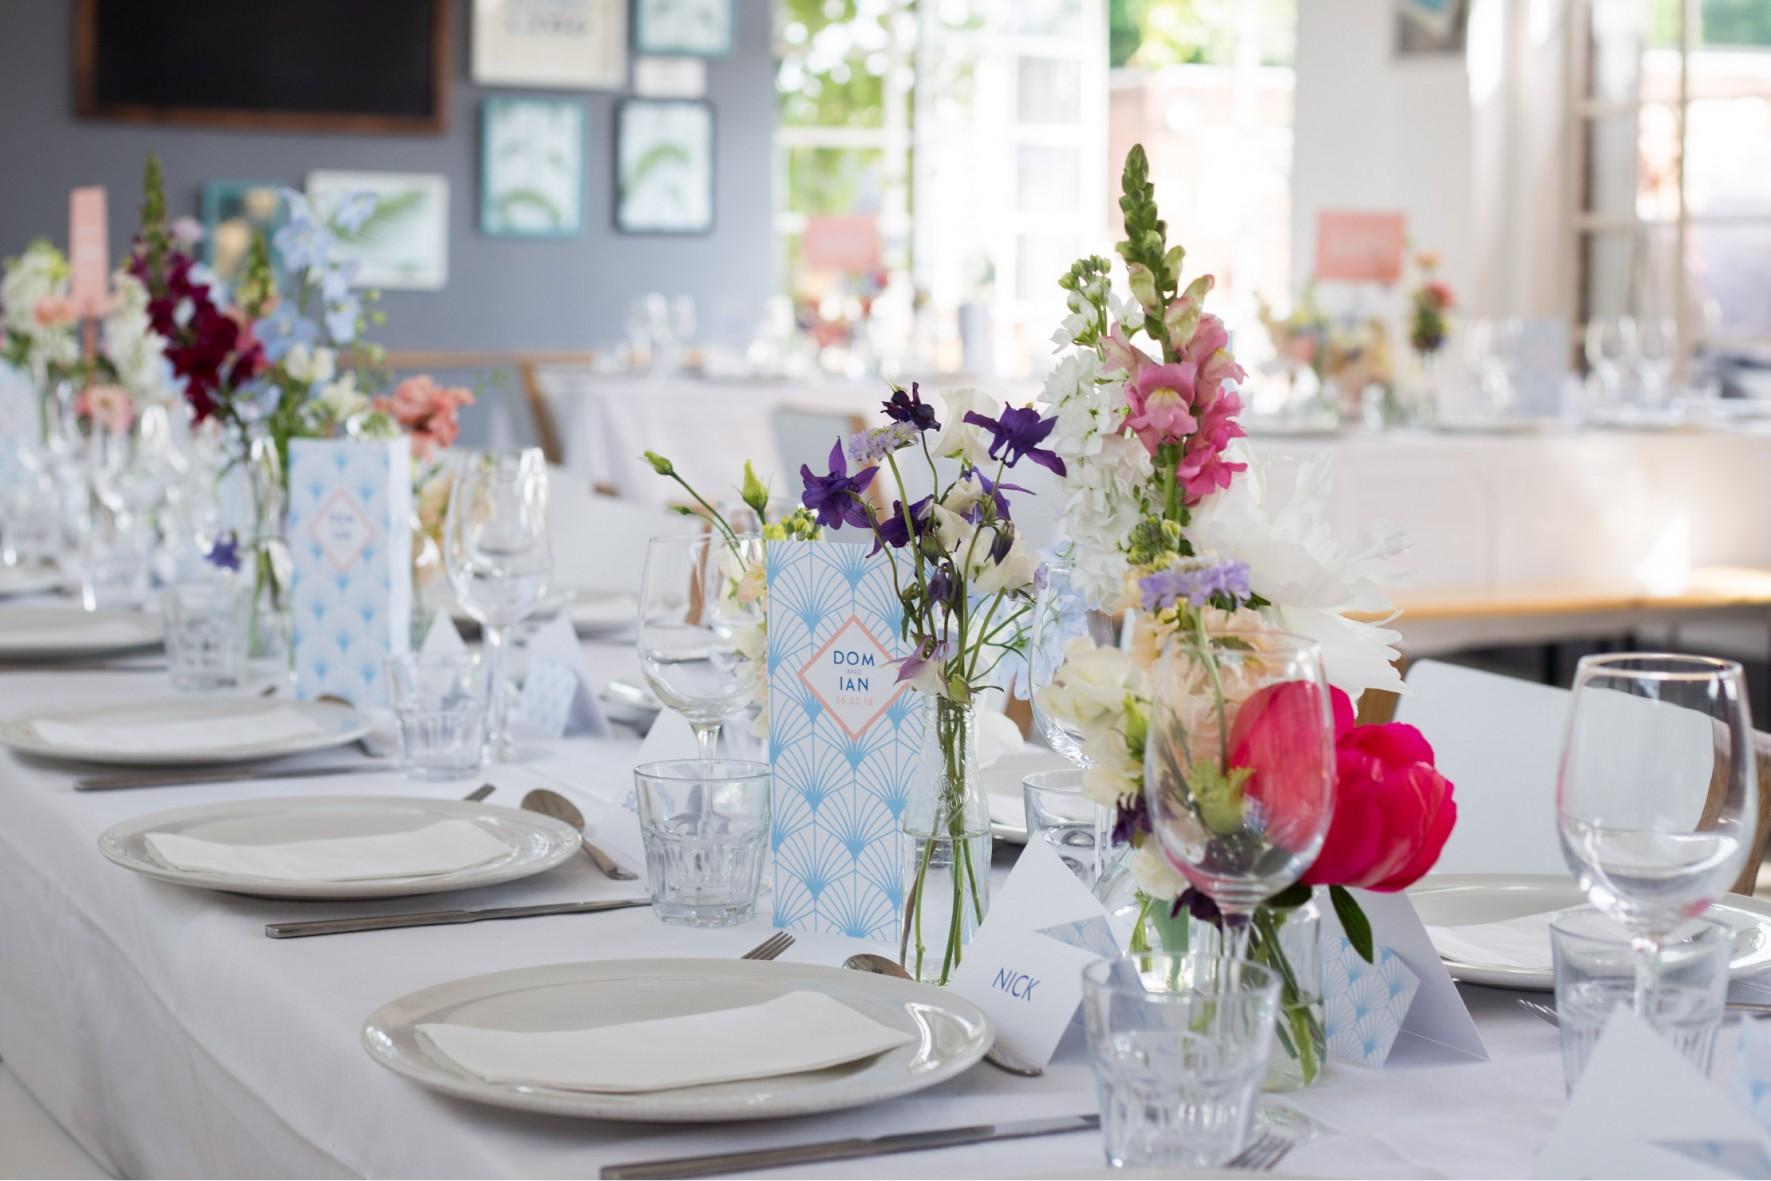 Brockwell Lido Wedding - Modern wedding styling and stationery by www.rosepaperscissors.com